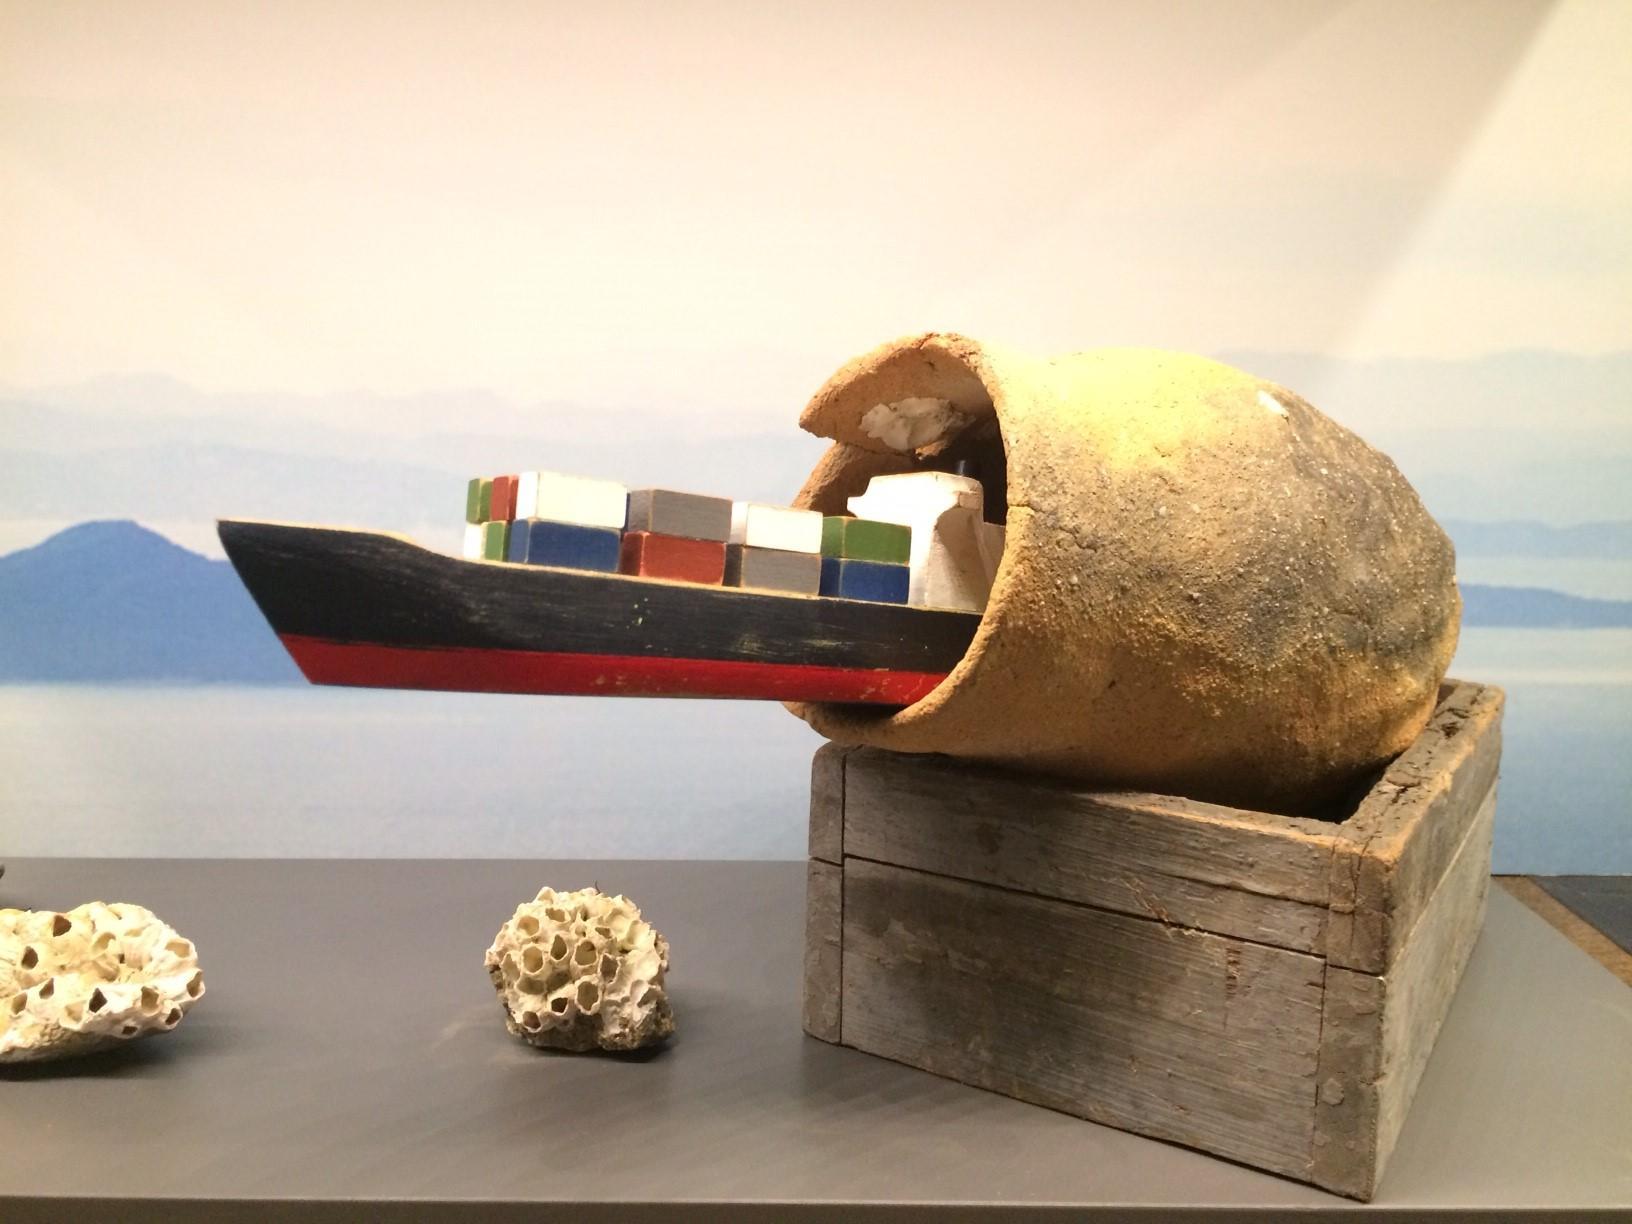 角文平が新作を出品中  「瀬戸内国際芸術祭」特別展示@Anjin